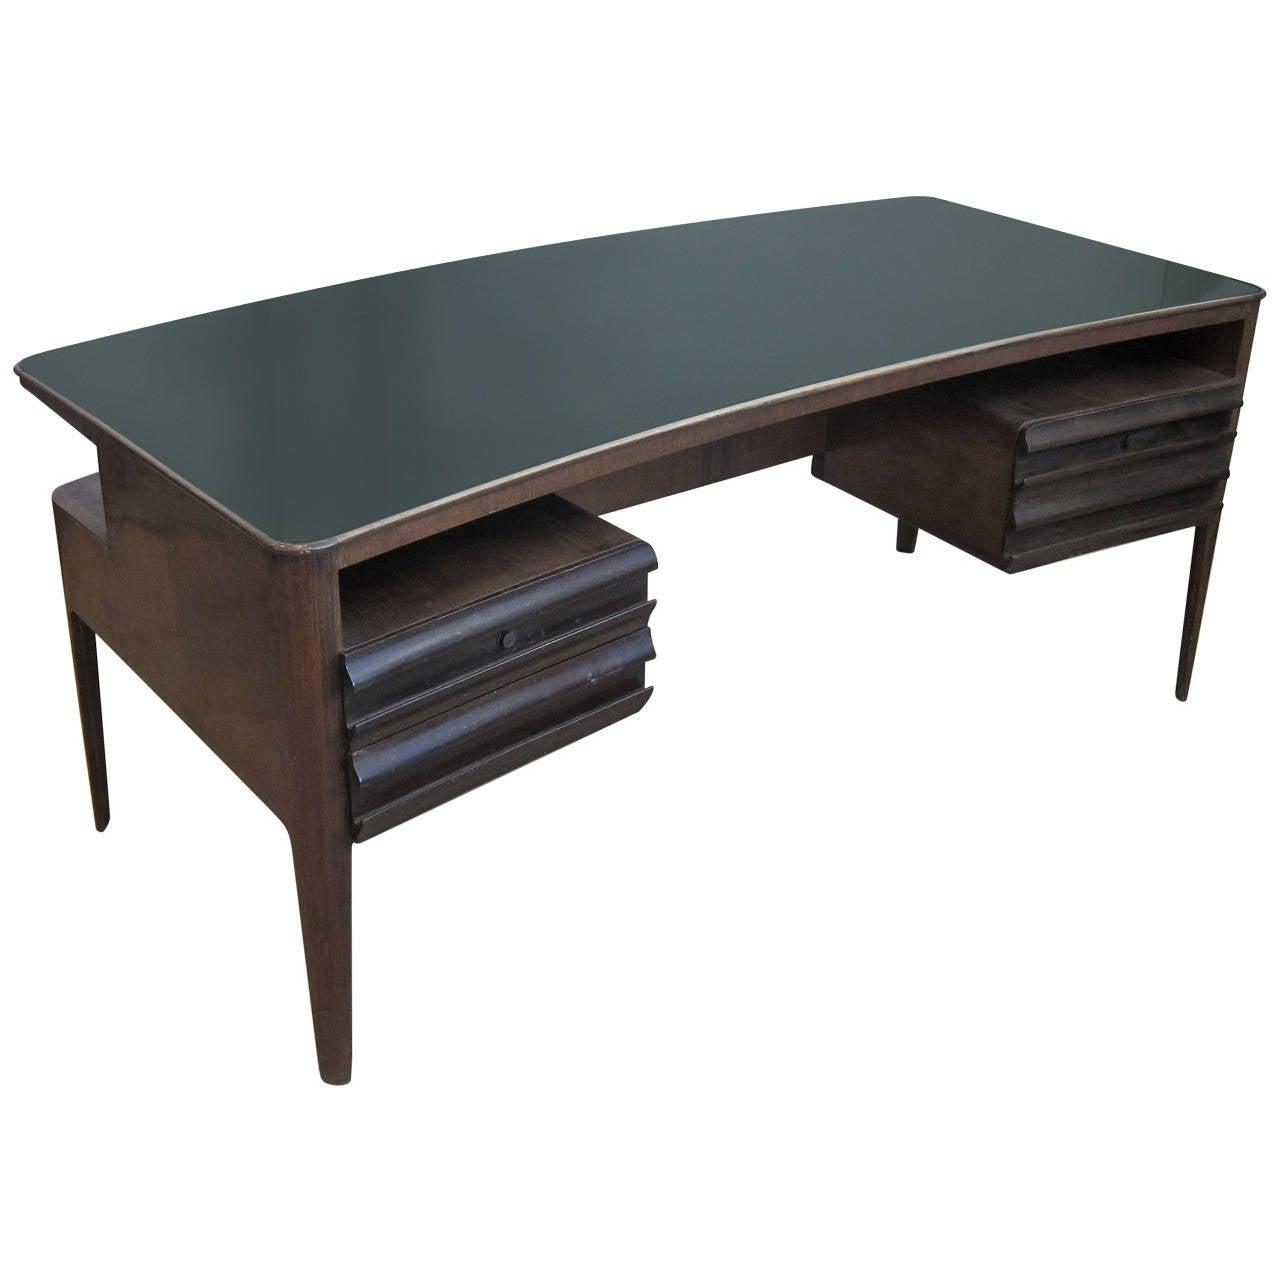 Rare Executive Desk By Gio Ponti At 1stdibs